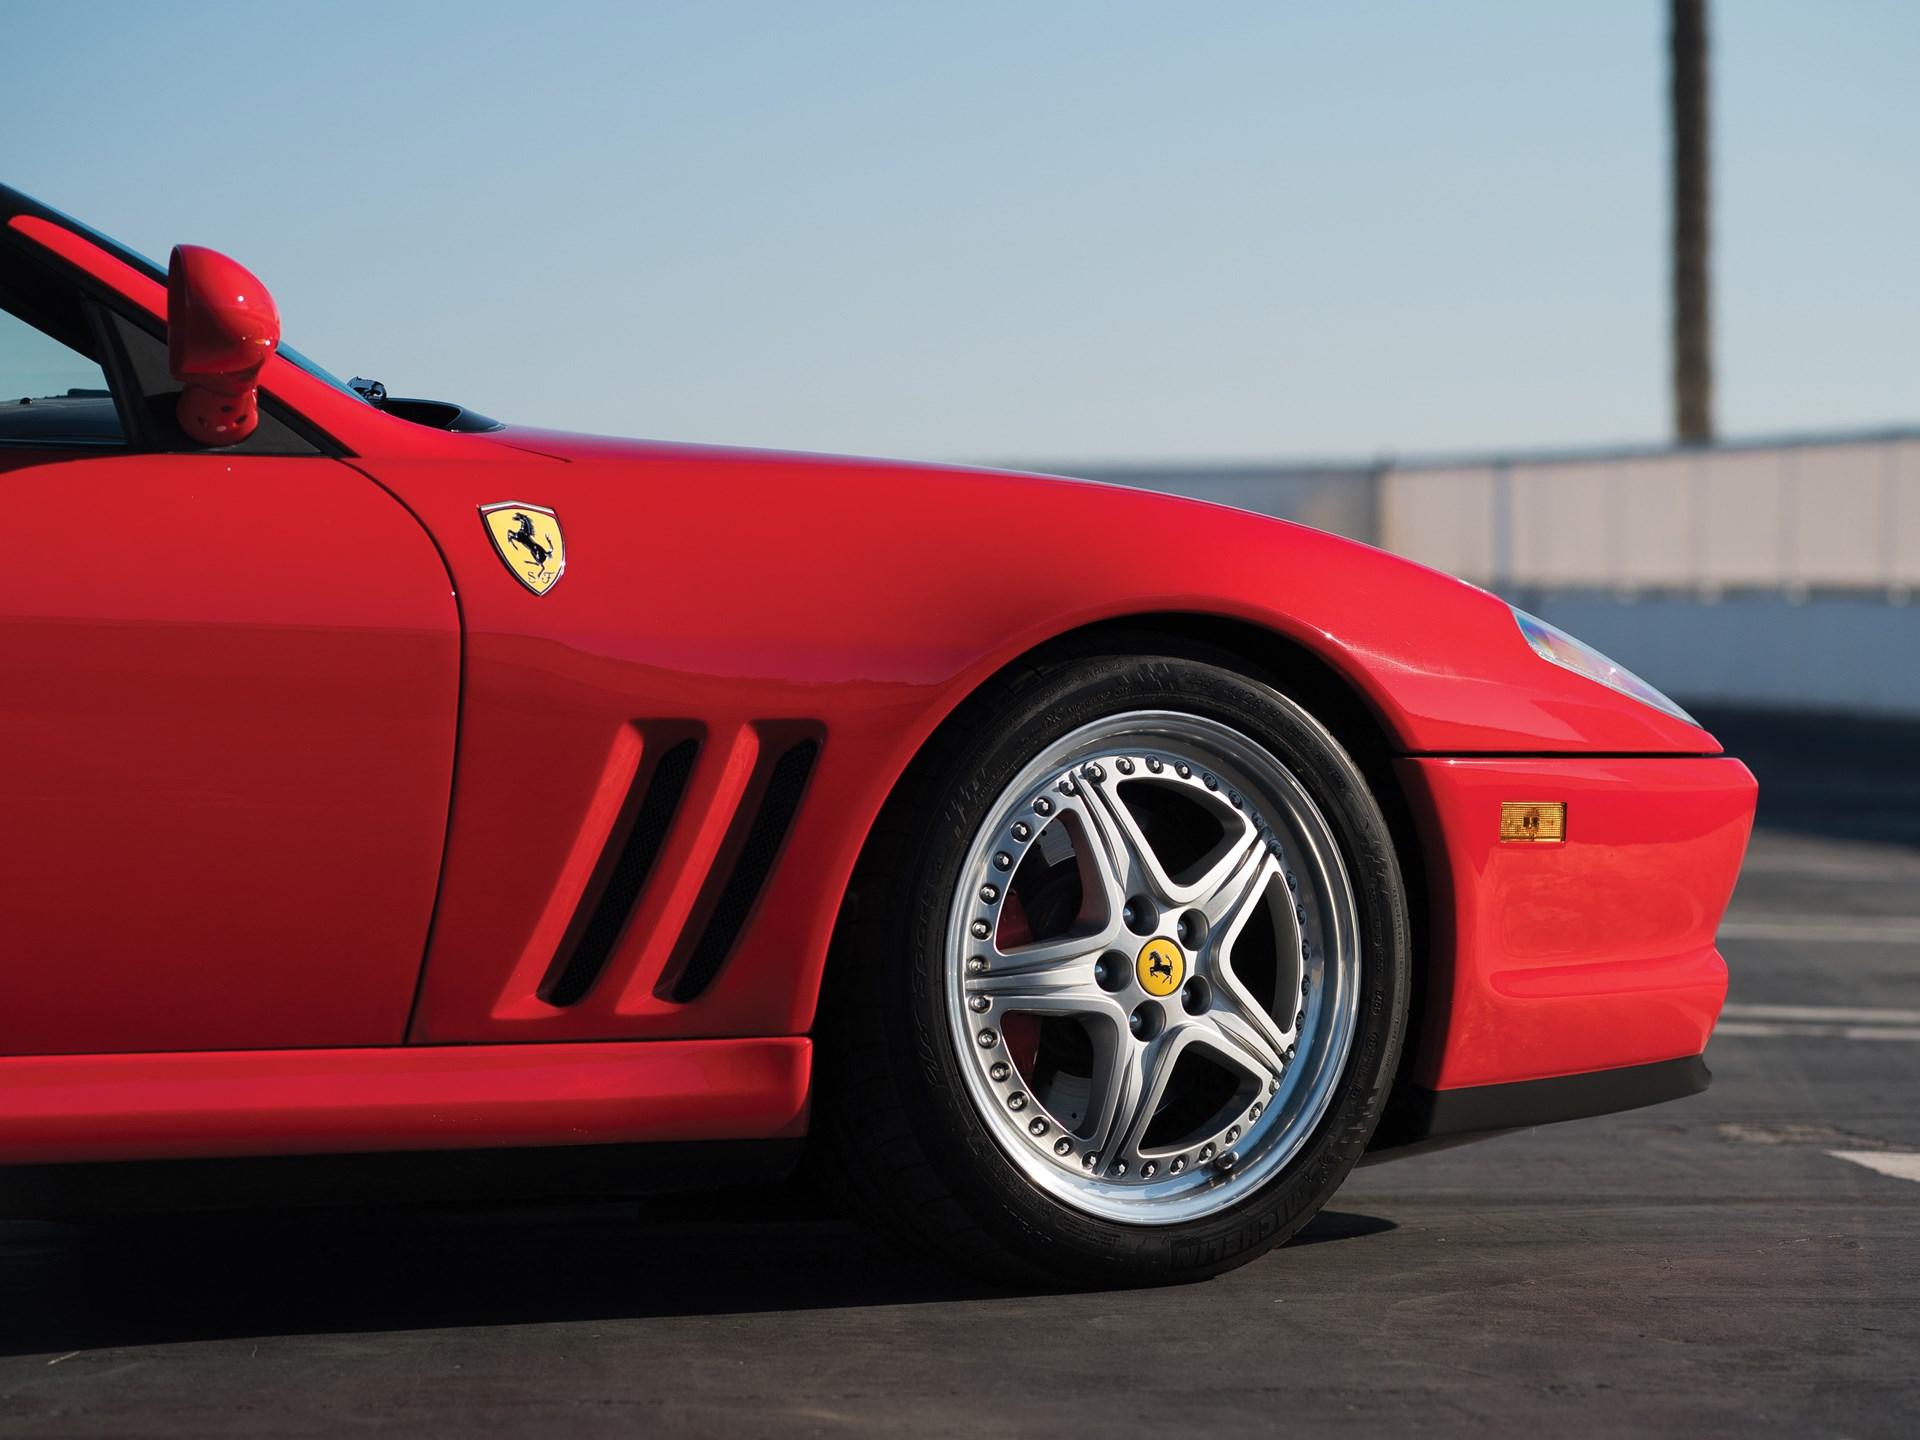 2001 Ferrari 550 Barchetta Pininfarina